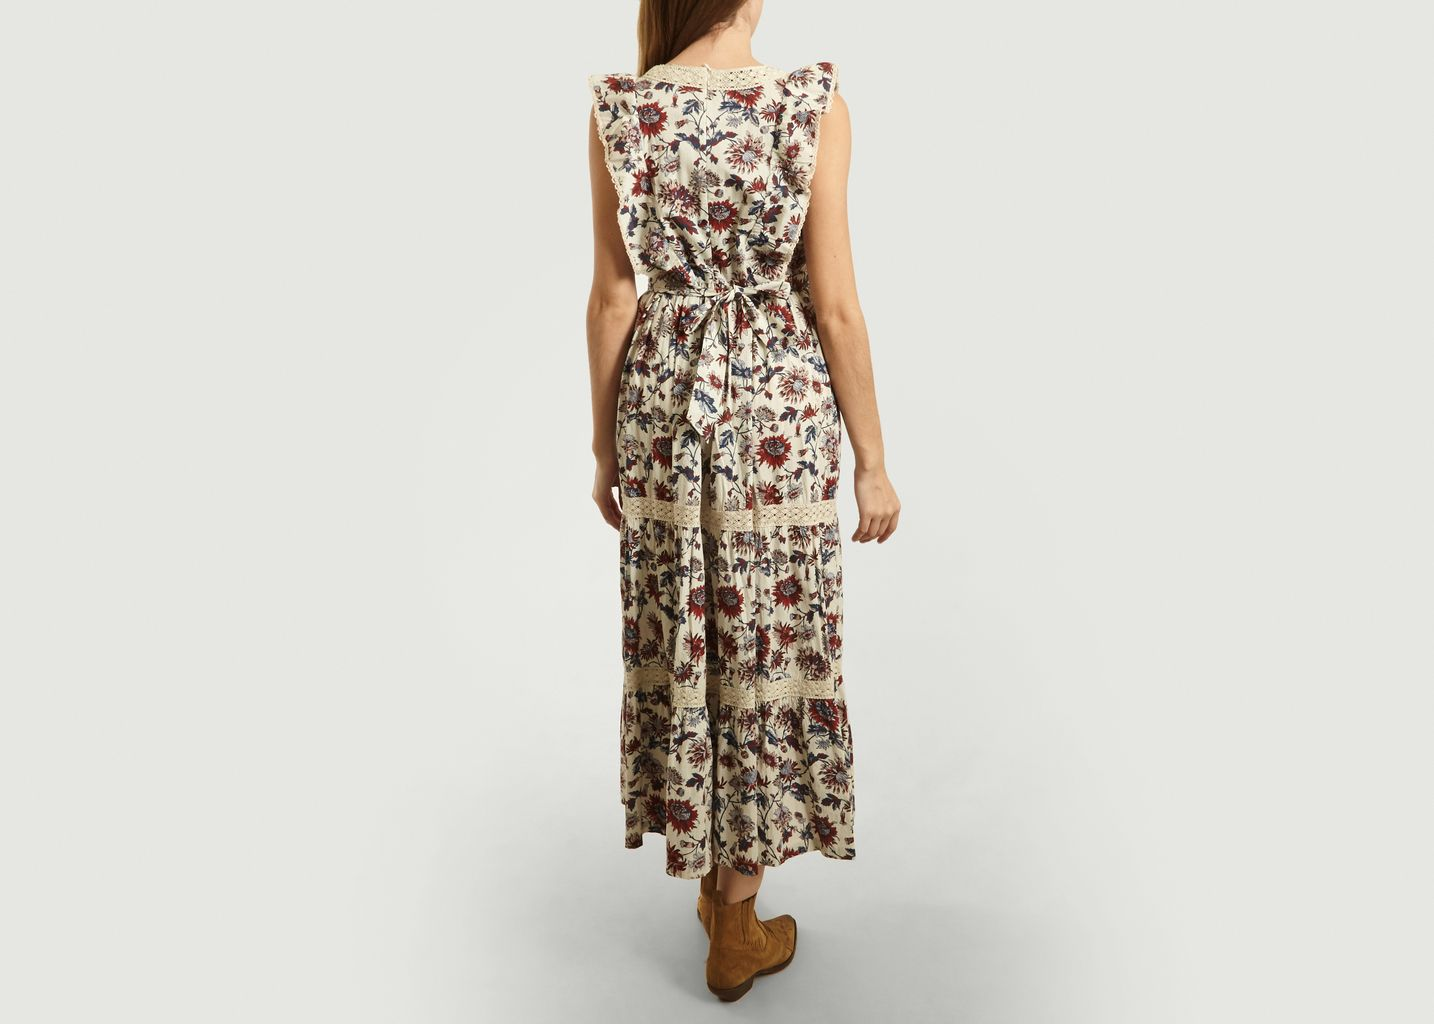 Robe Longue Bella Brodée à Imprimé Fleuri - Soeur